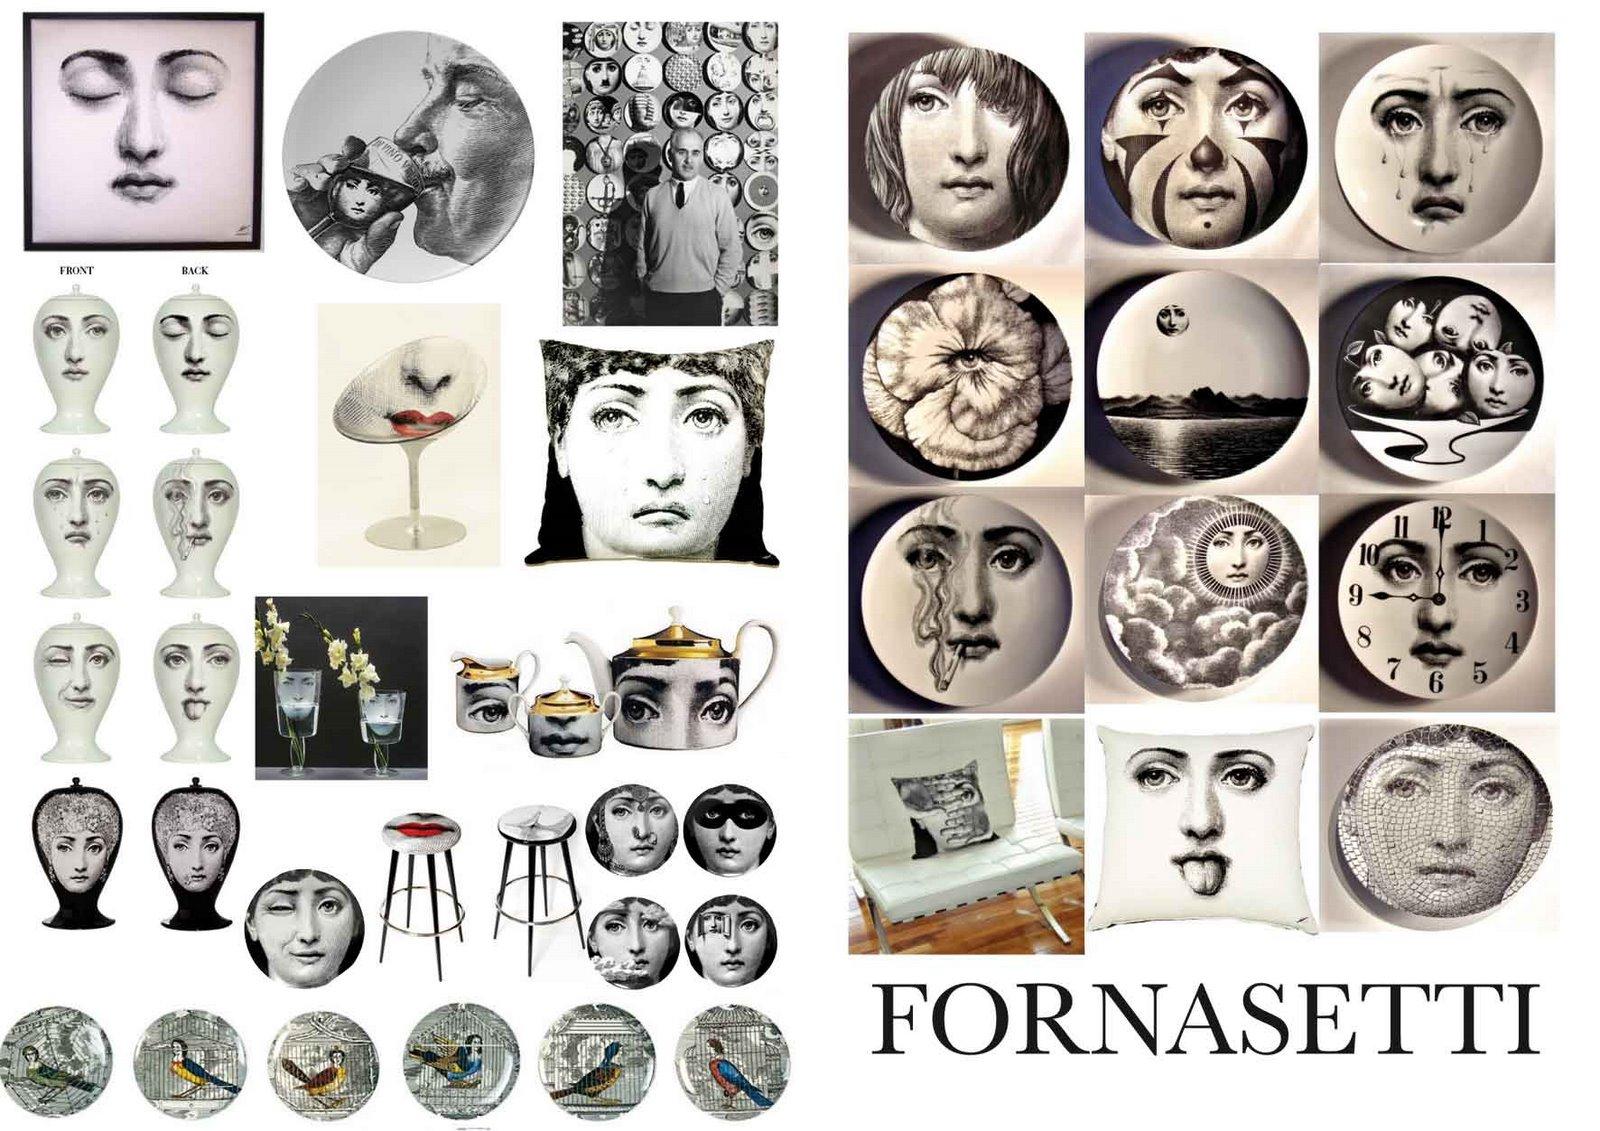 free wallpicz fornasetti wallpaper cole son. Black Bedroom Furniture Sets. Home Design Ideas